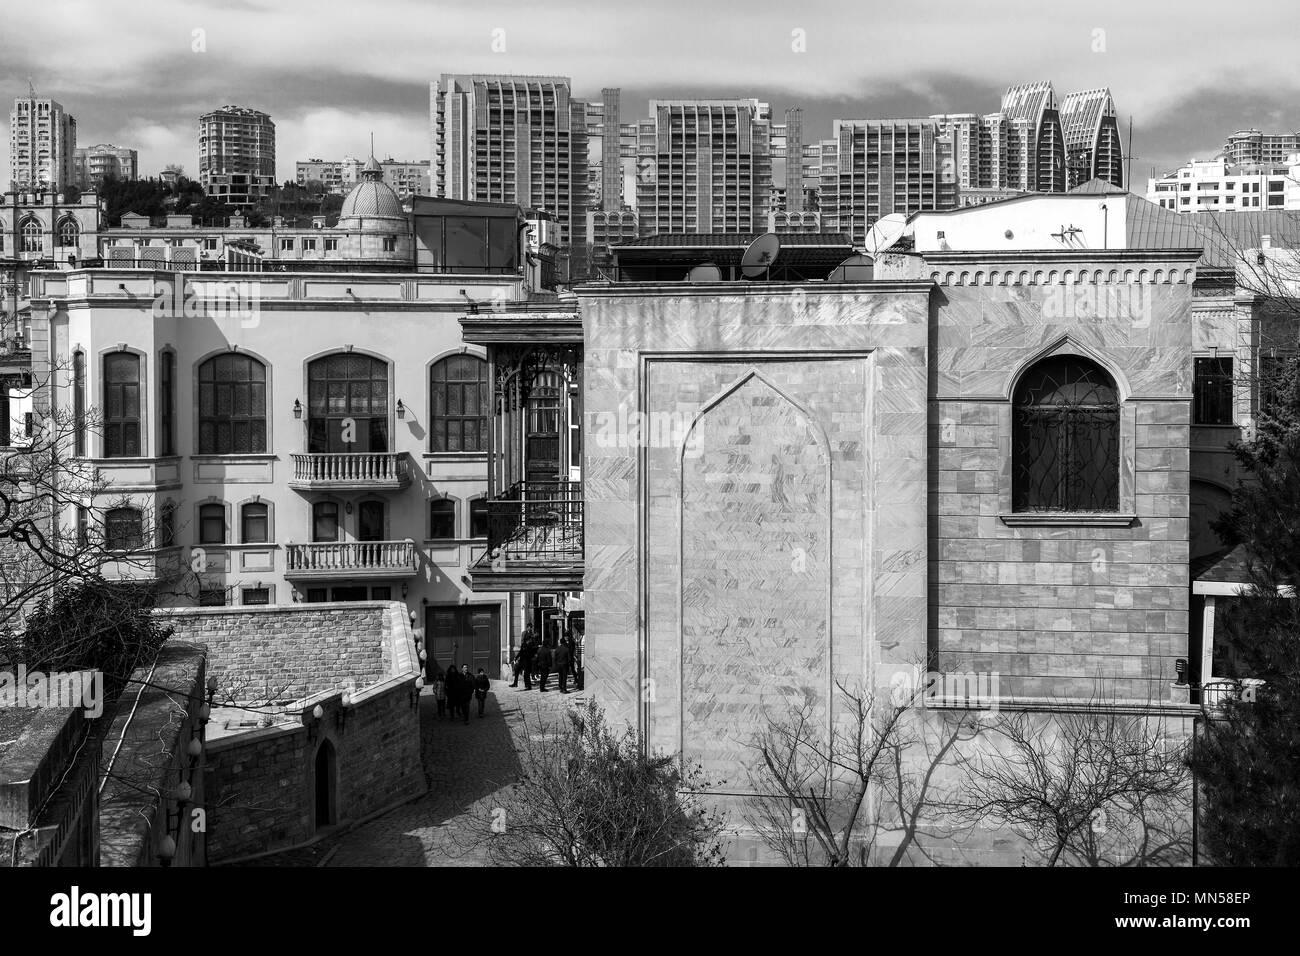 View of Baku old town and new buildings. Baku, Azerbaijan, march 2018. - Stock Image